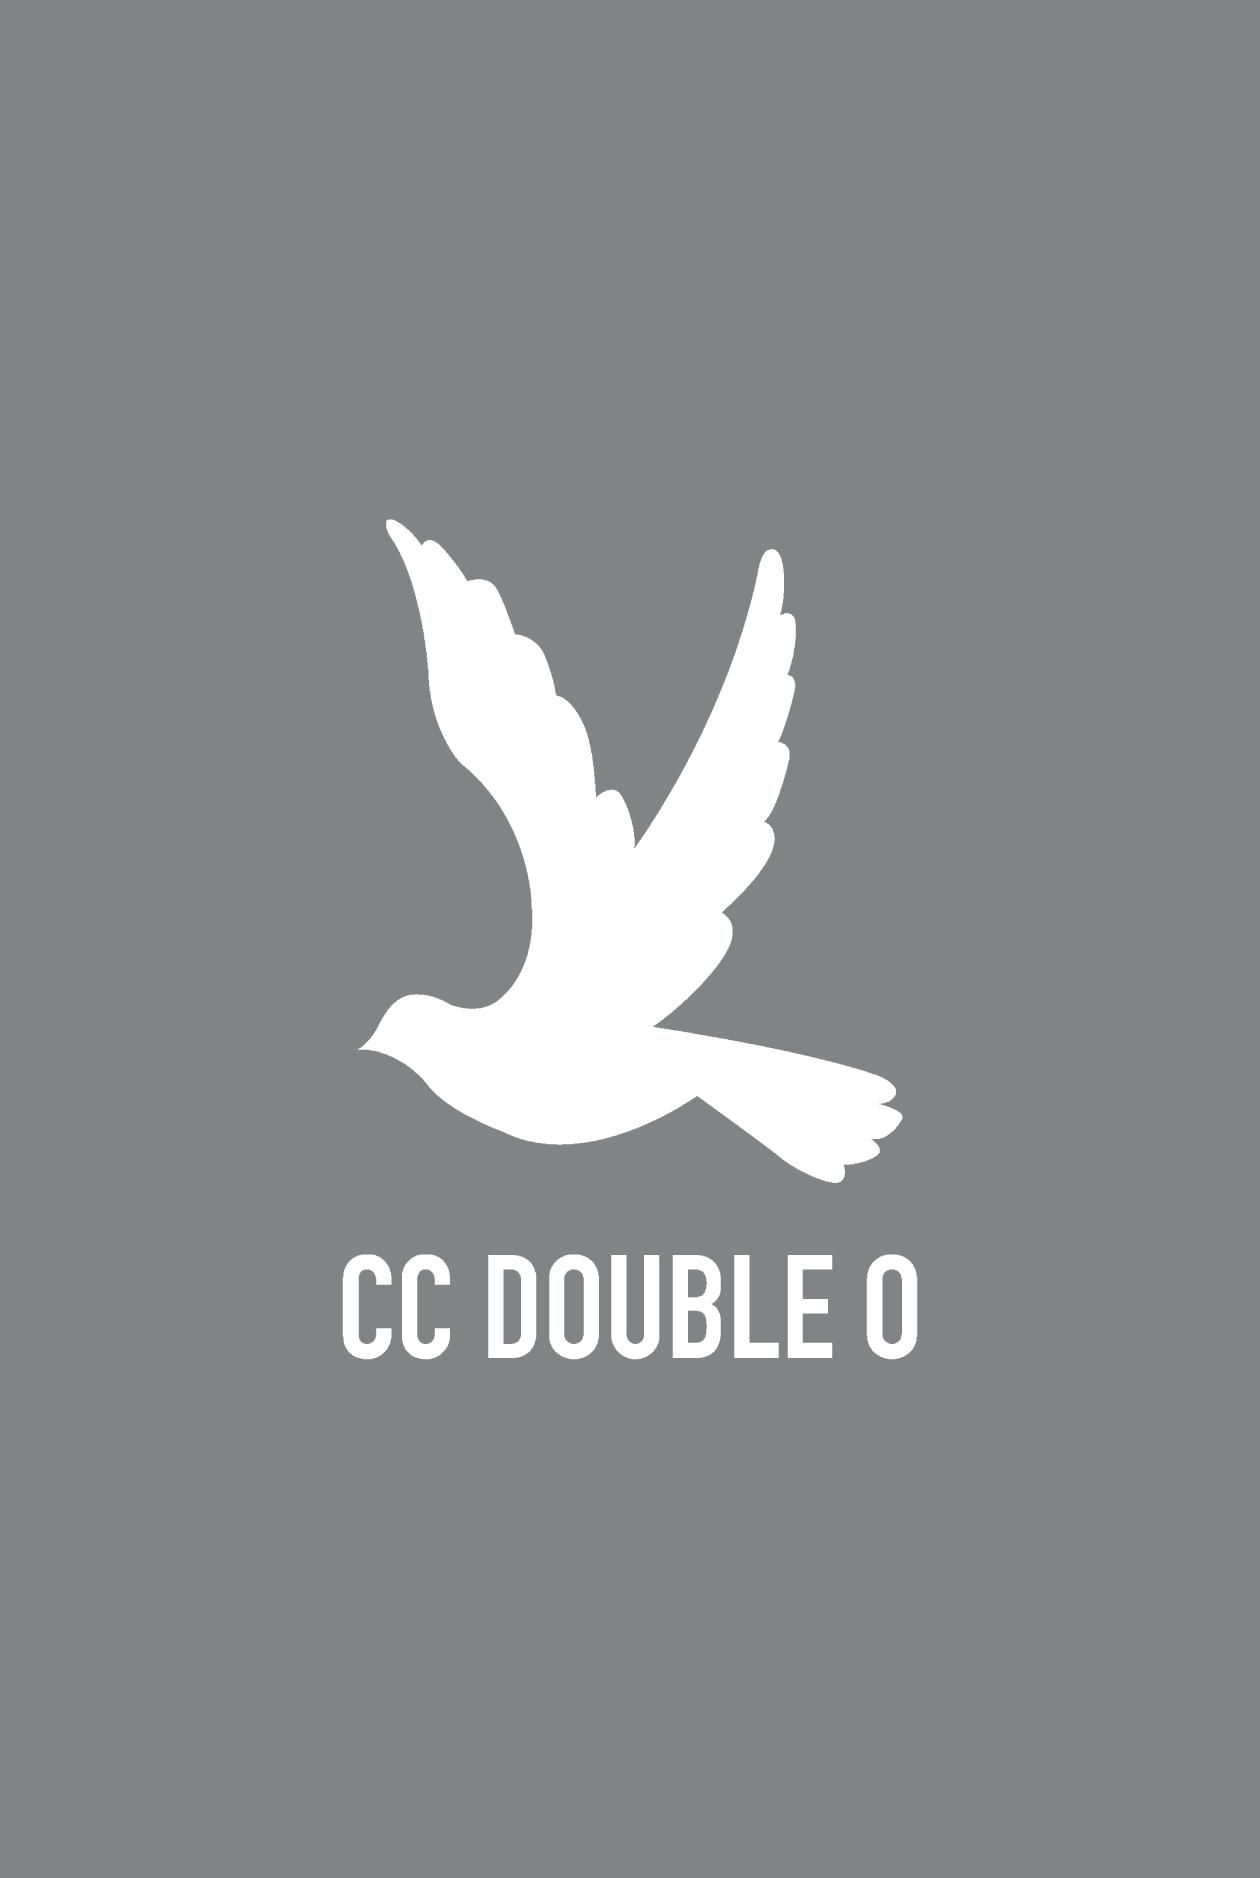 CC DOUBLE O Long-Sleeved Checkered Shirt